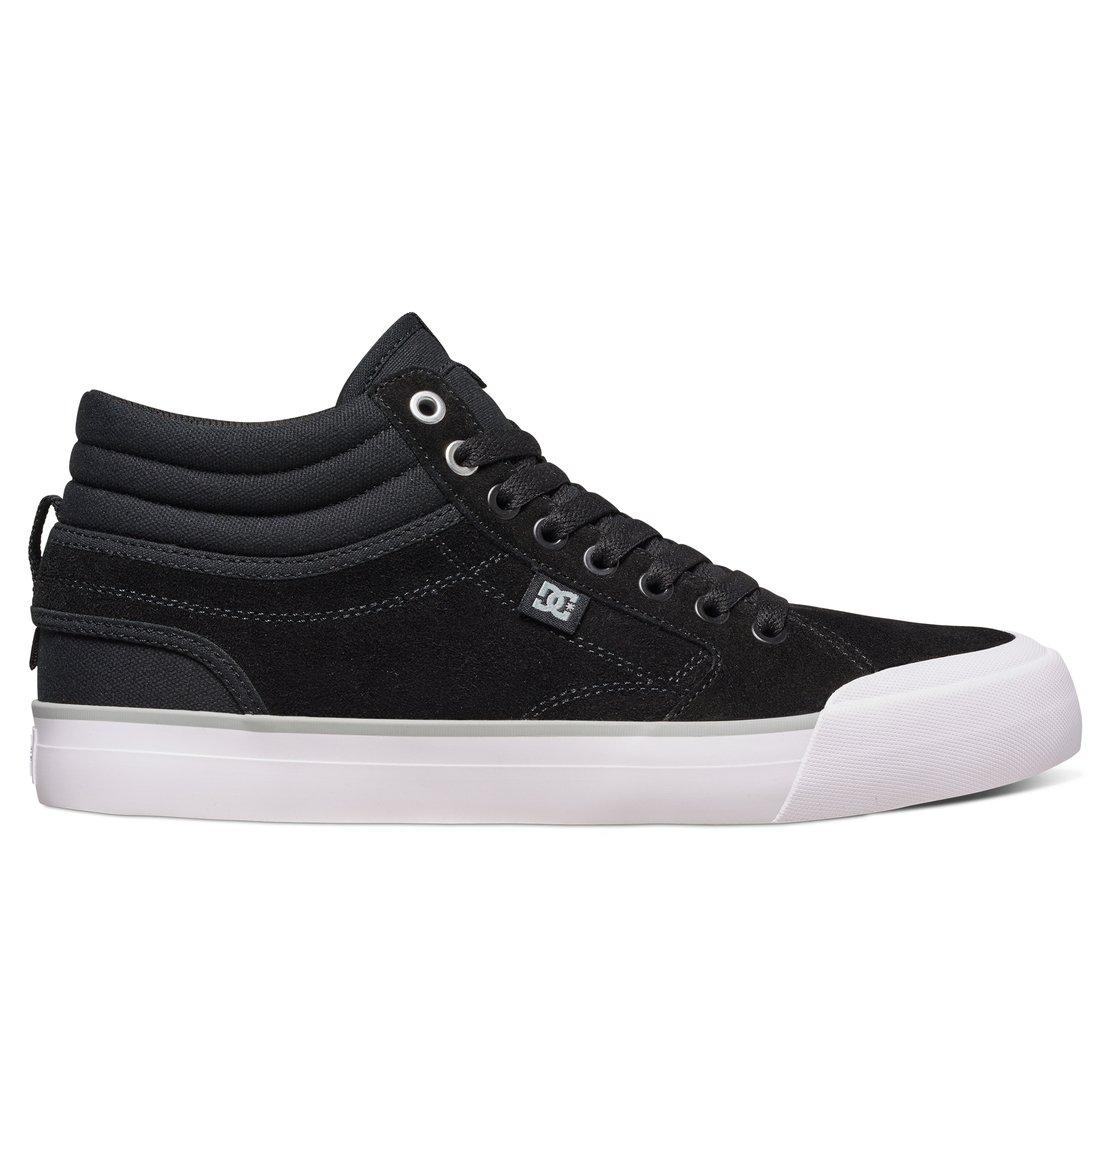 dc shoes Wes Kremer 2 X Sk8Mafia - Scarpe da Uomo - Black - DC Shoes